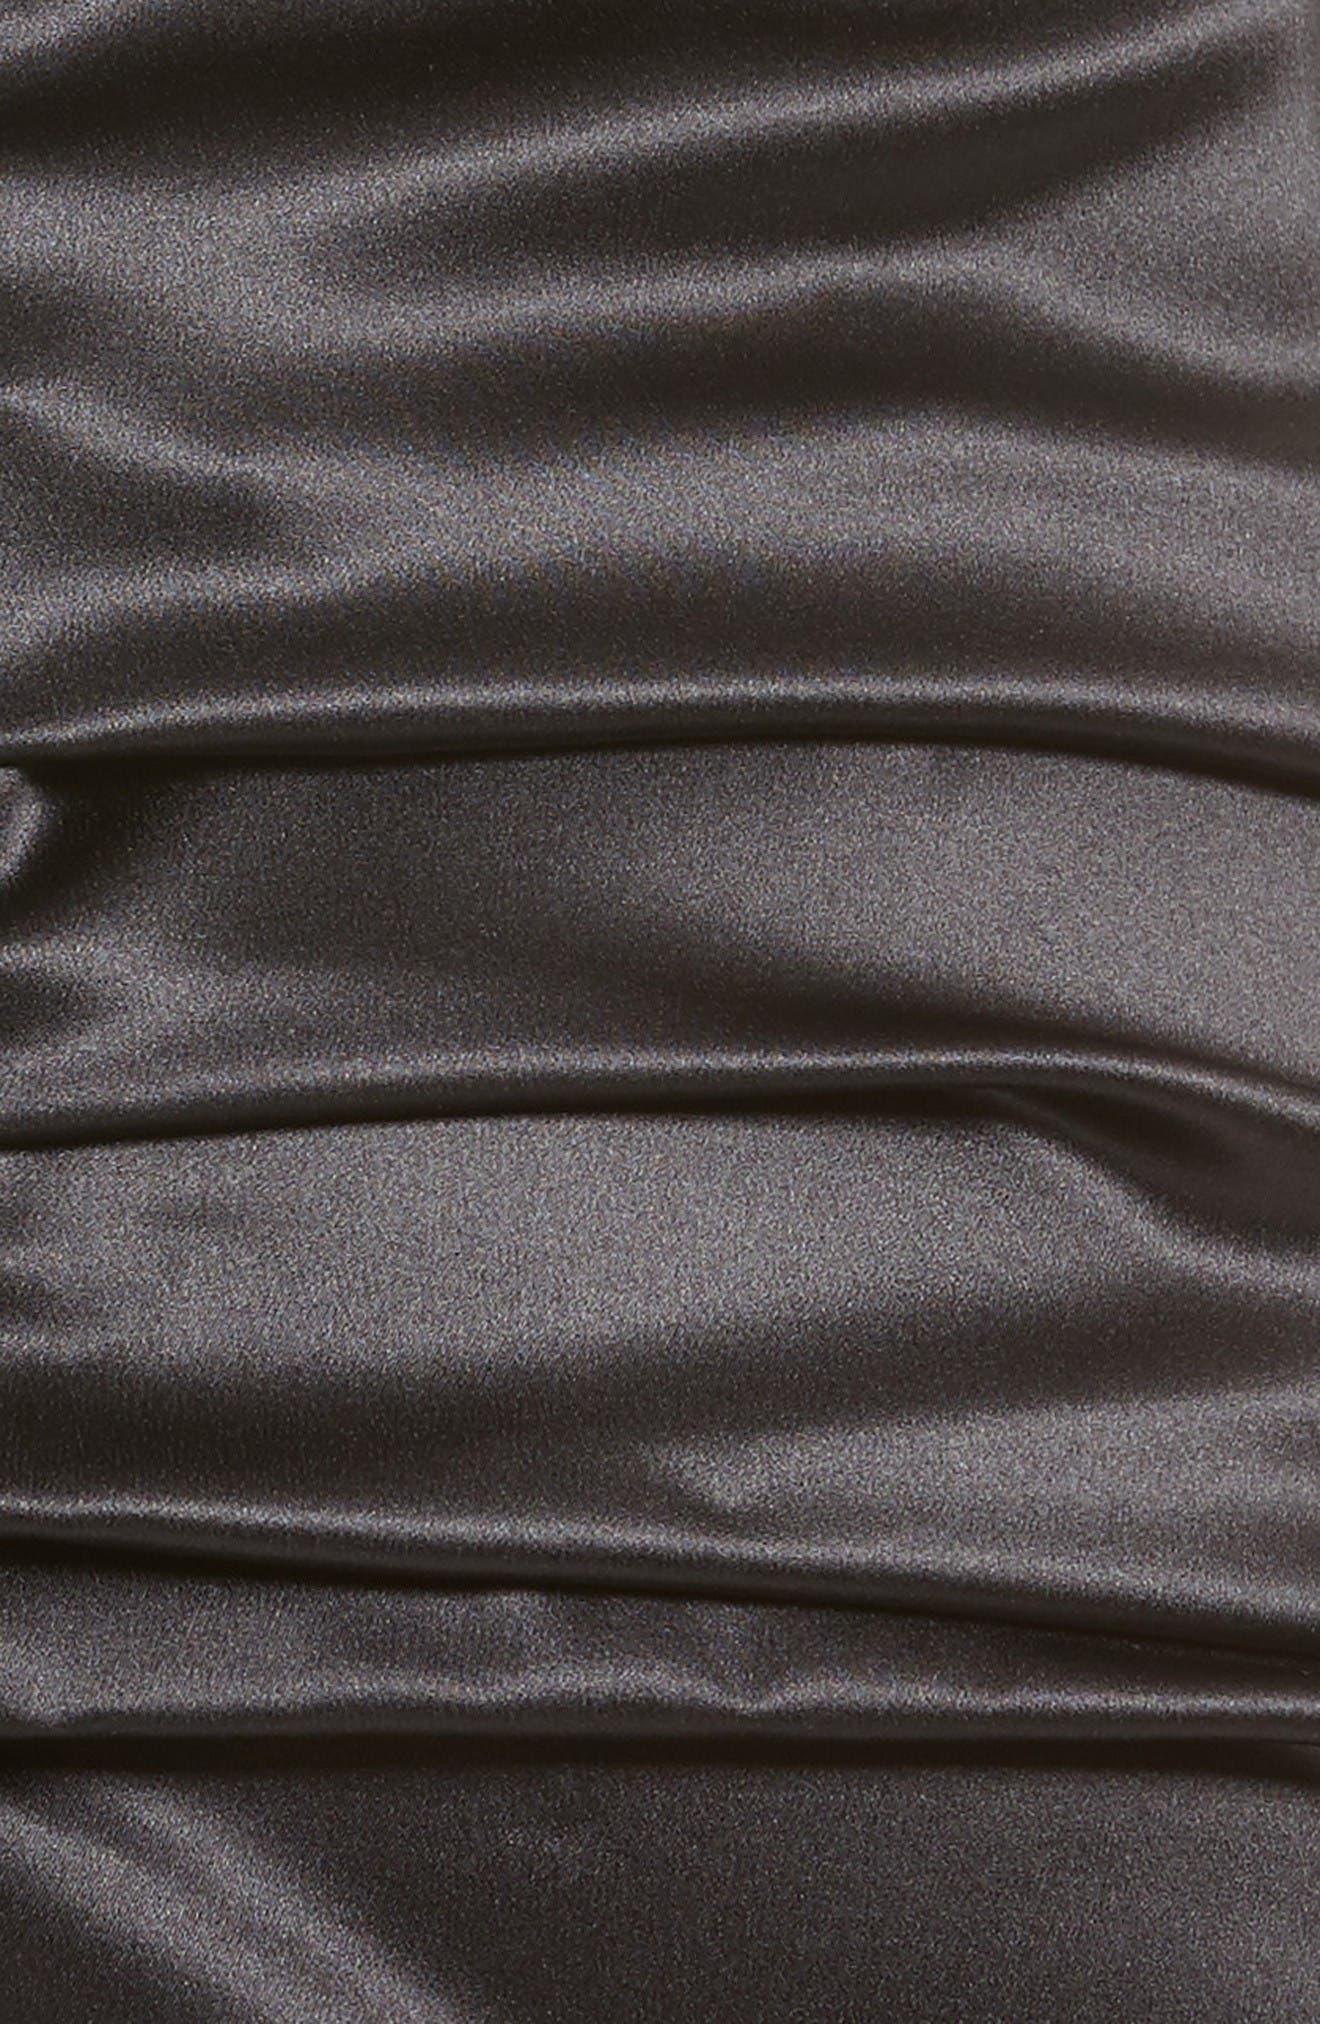 Ruched Stretch Satin Dress,                             Alternate thumbnail 3, color,                             Black